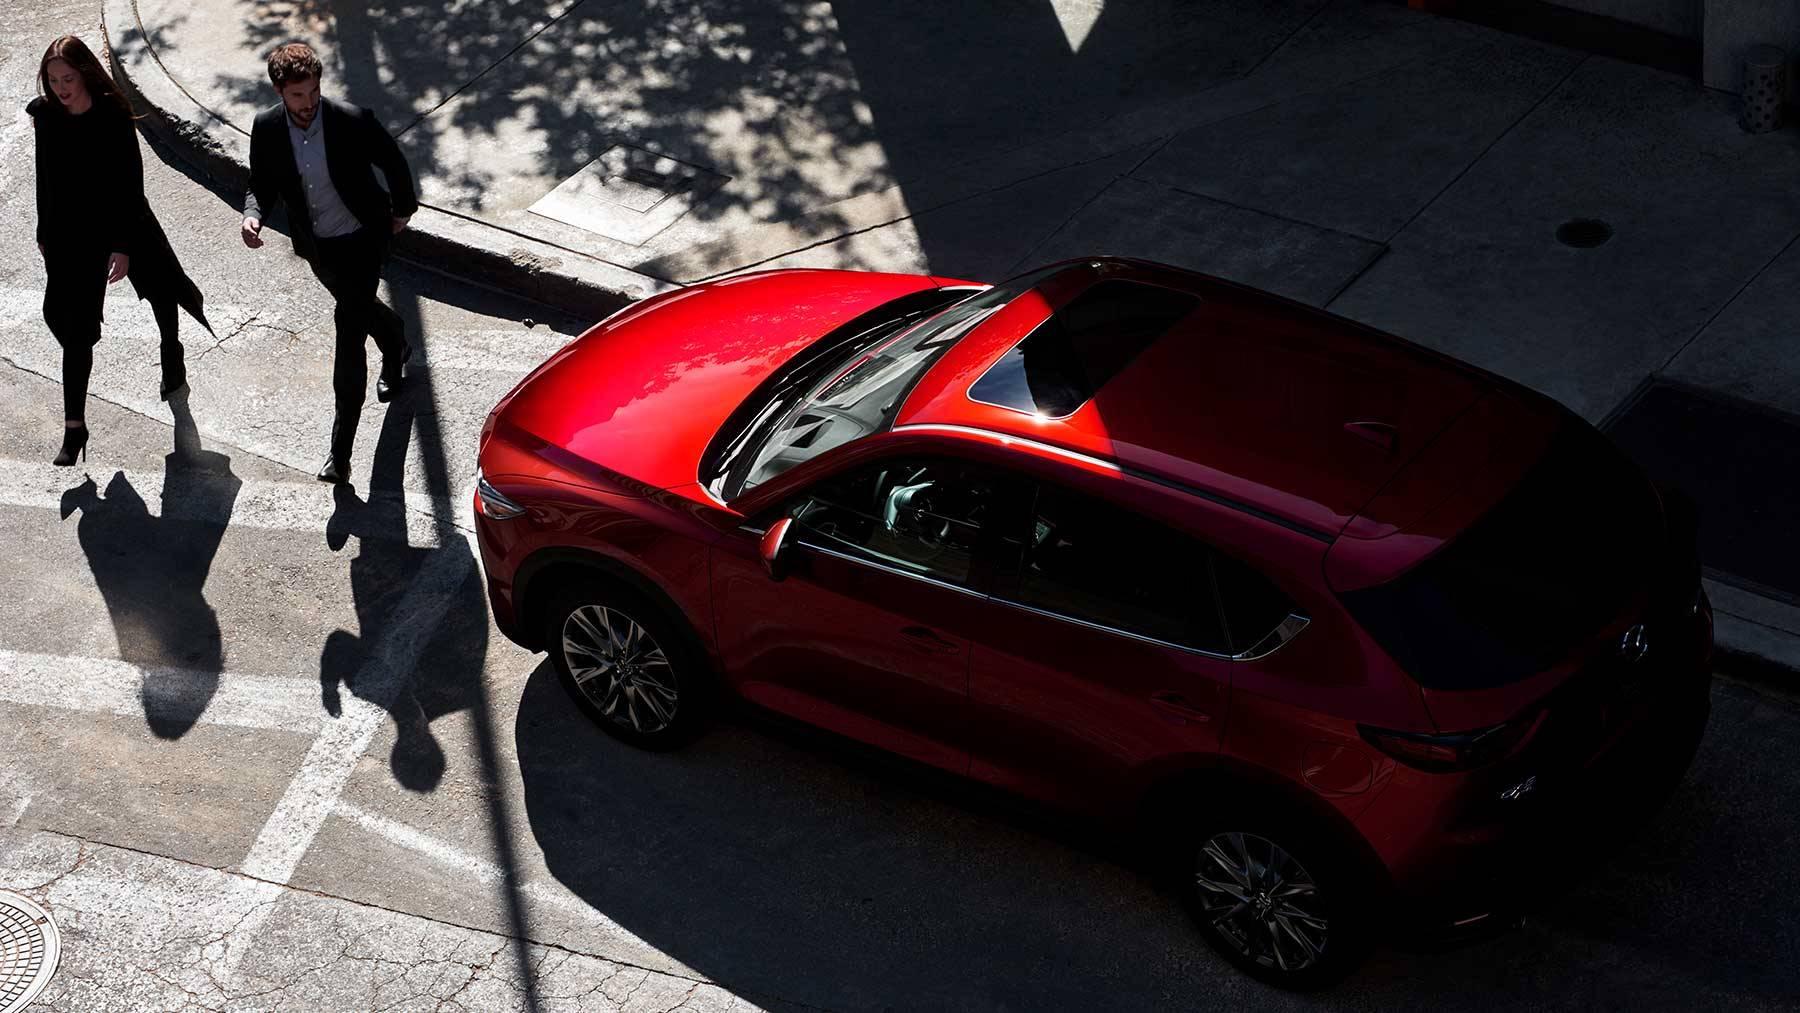 2019 Mazda CX-5 for Sale near Austin, TX